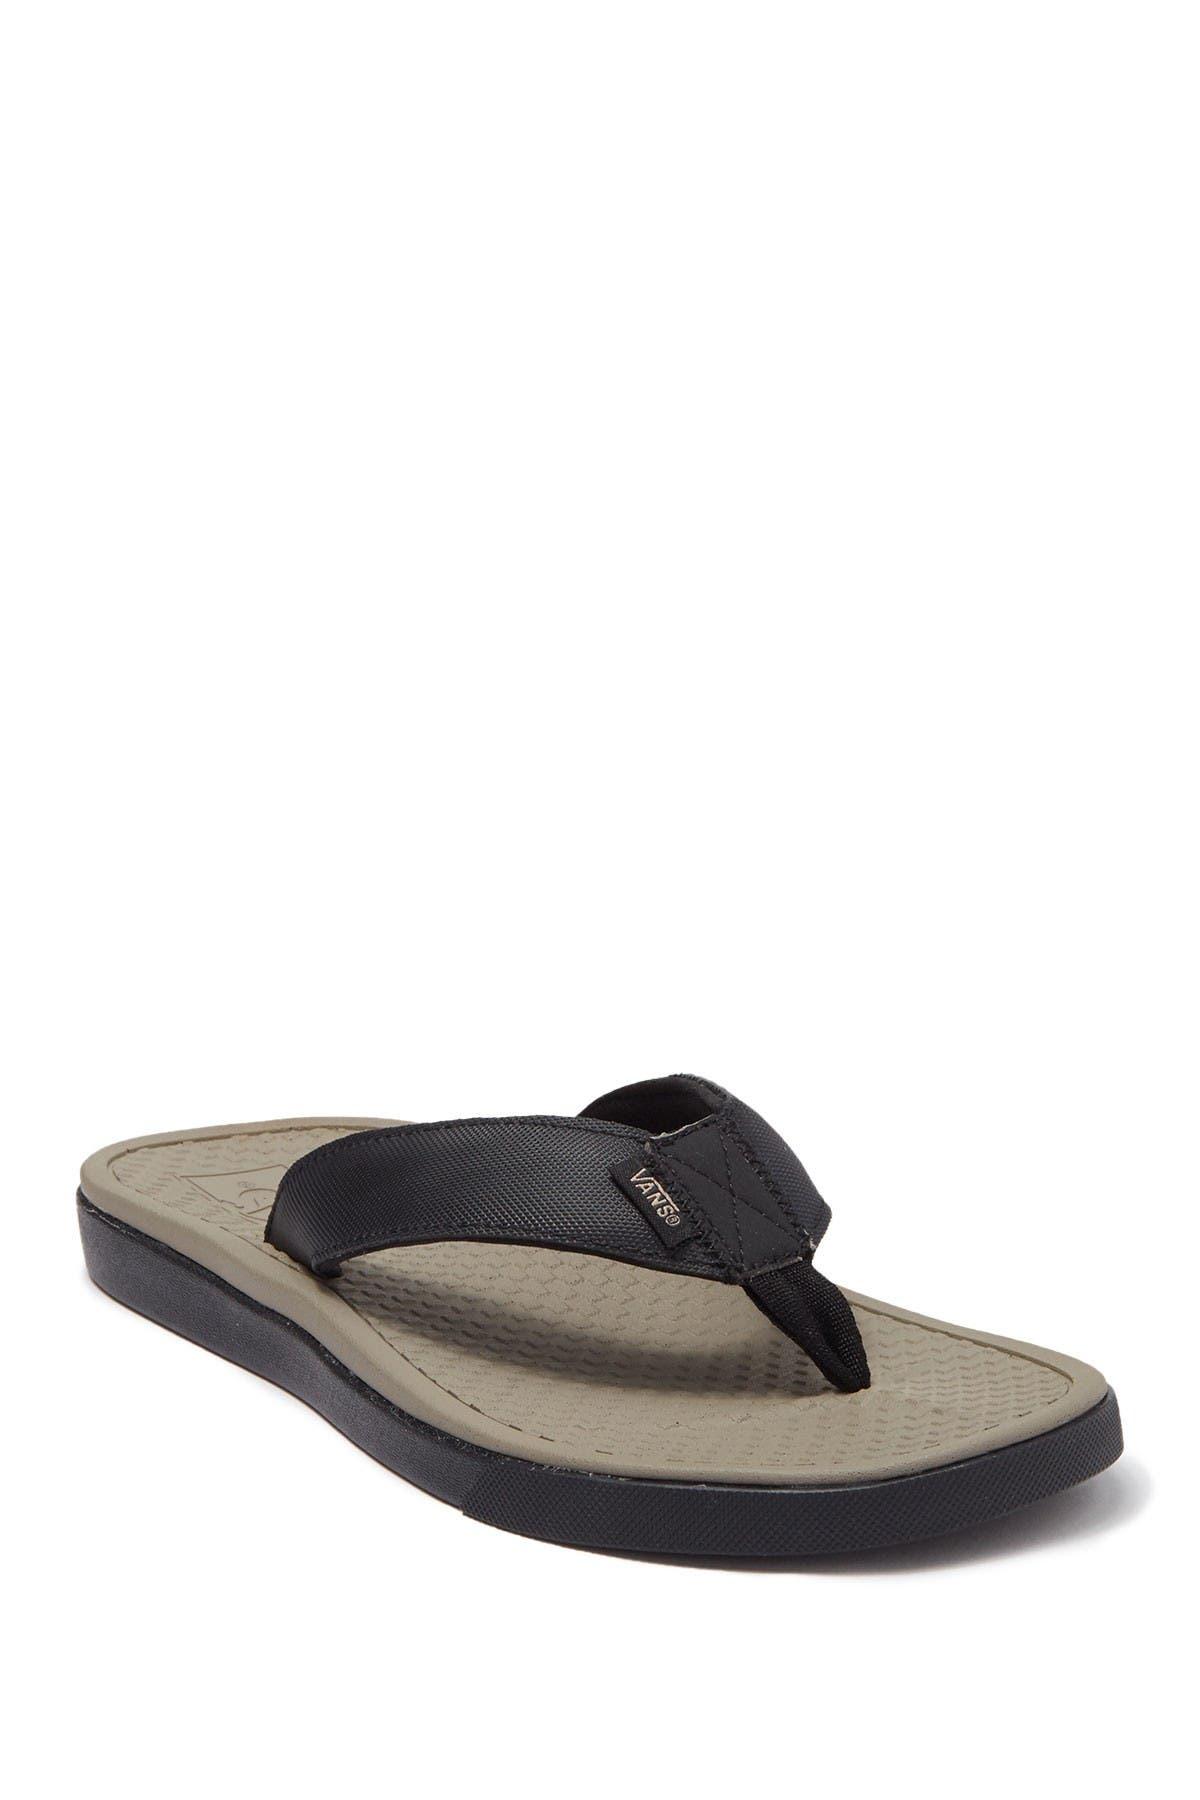 Image of VANS Ultrascush Sea Esta Flip Flop Sandal